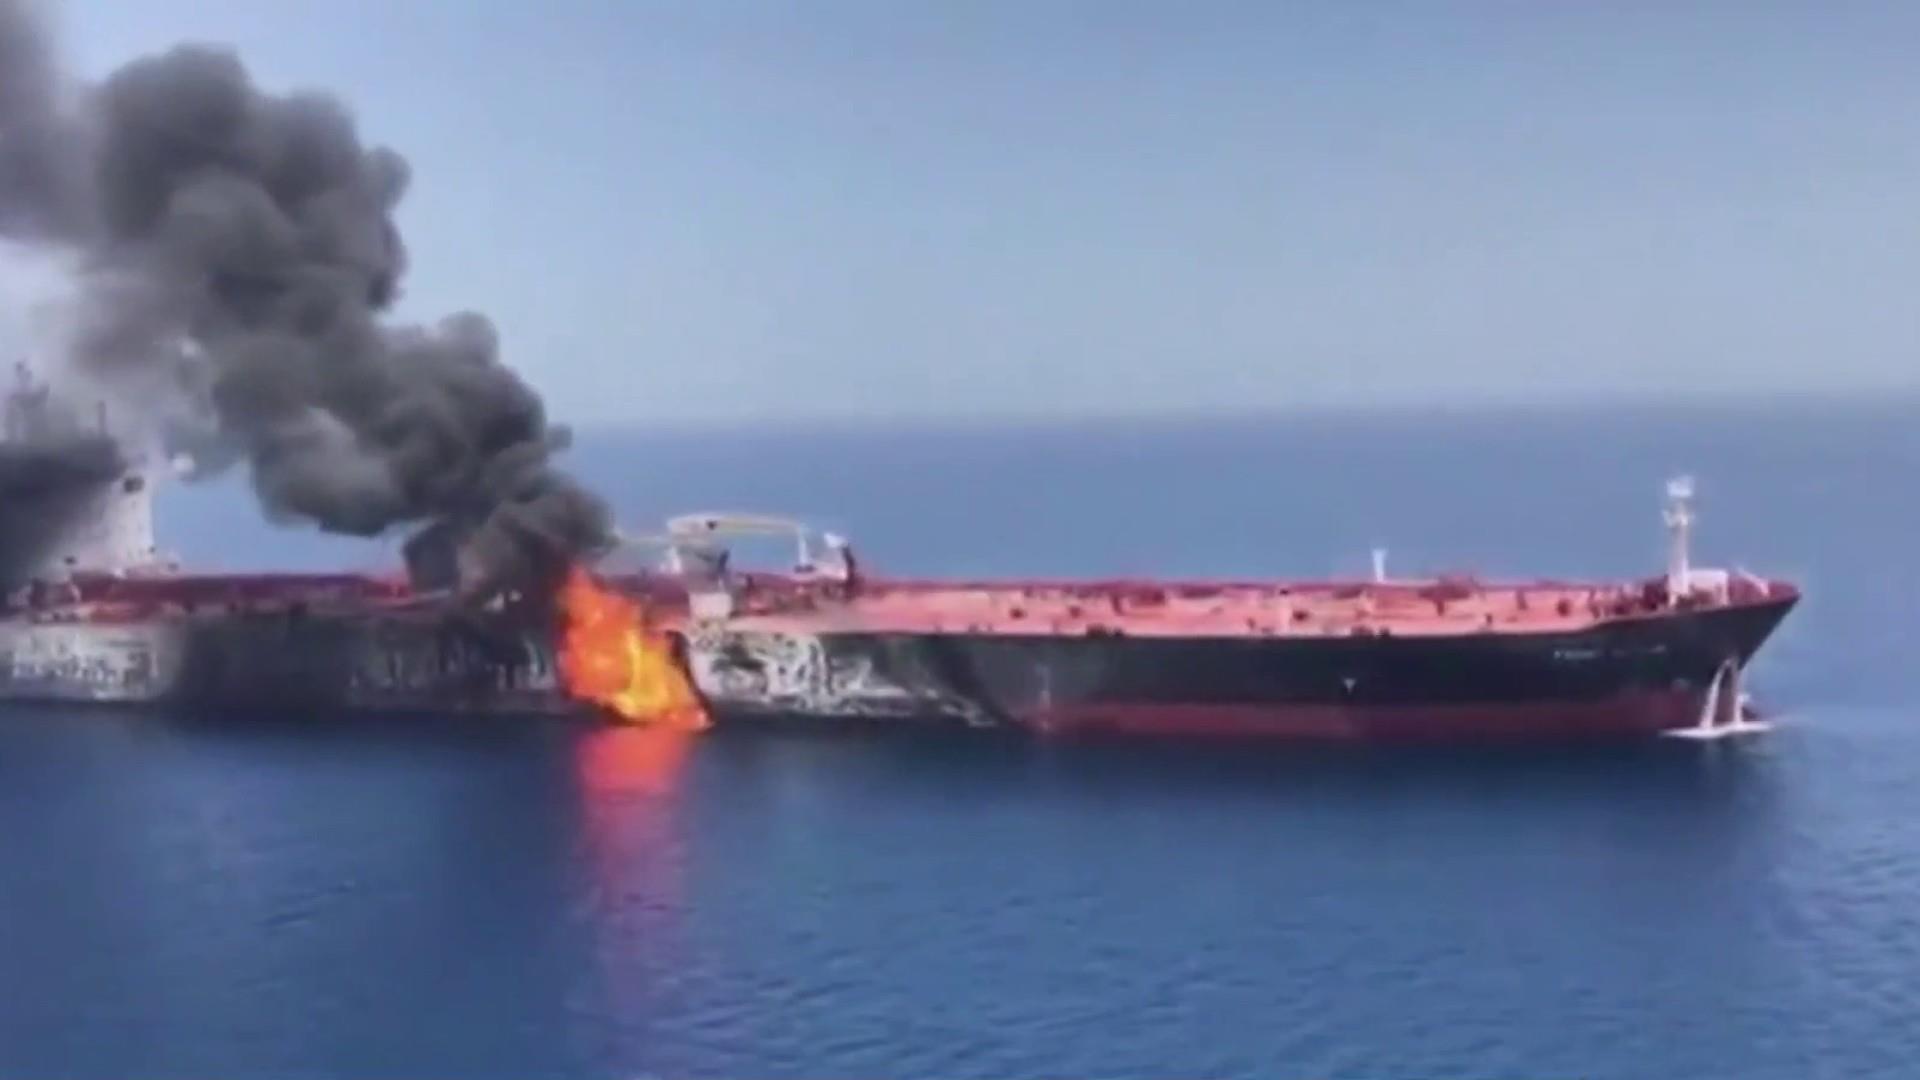 Pompeo constructs Iran narrative moving US toward war footing